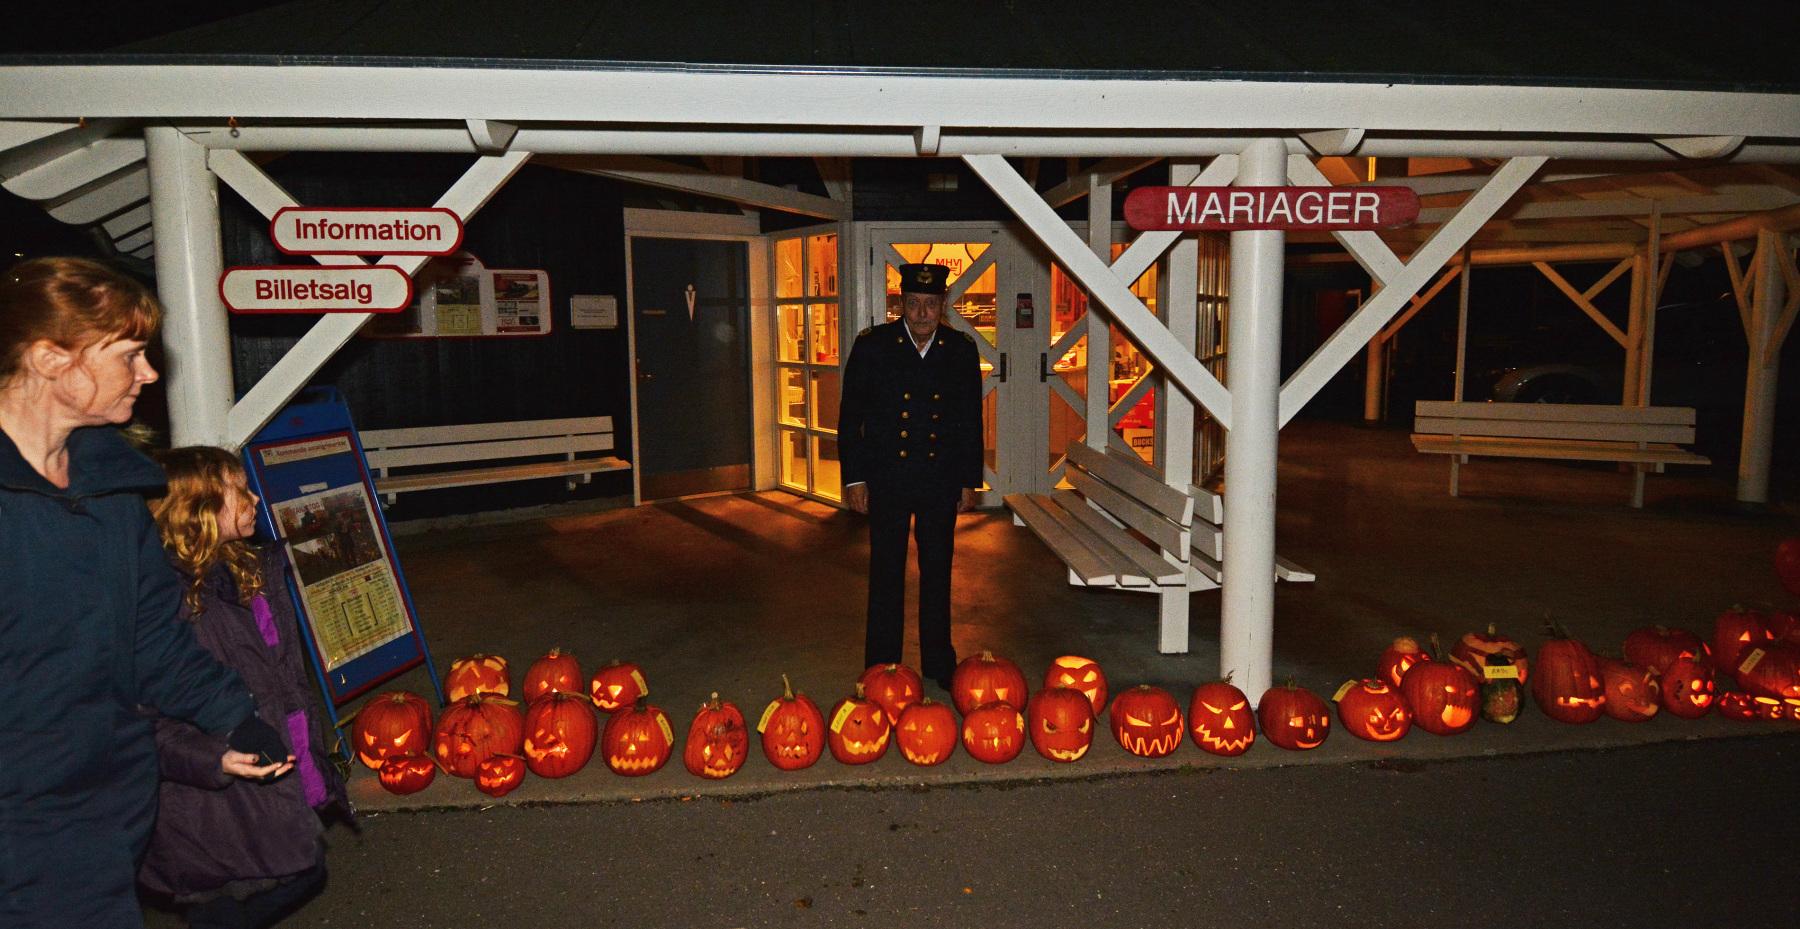 Mariager-station-med-flotte-Halloween-lamper-fotoAsgerChristiansen